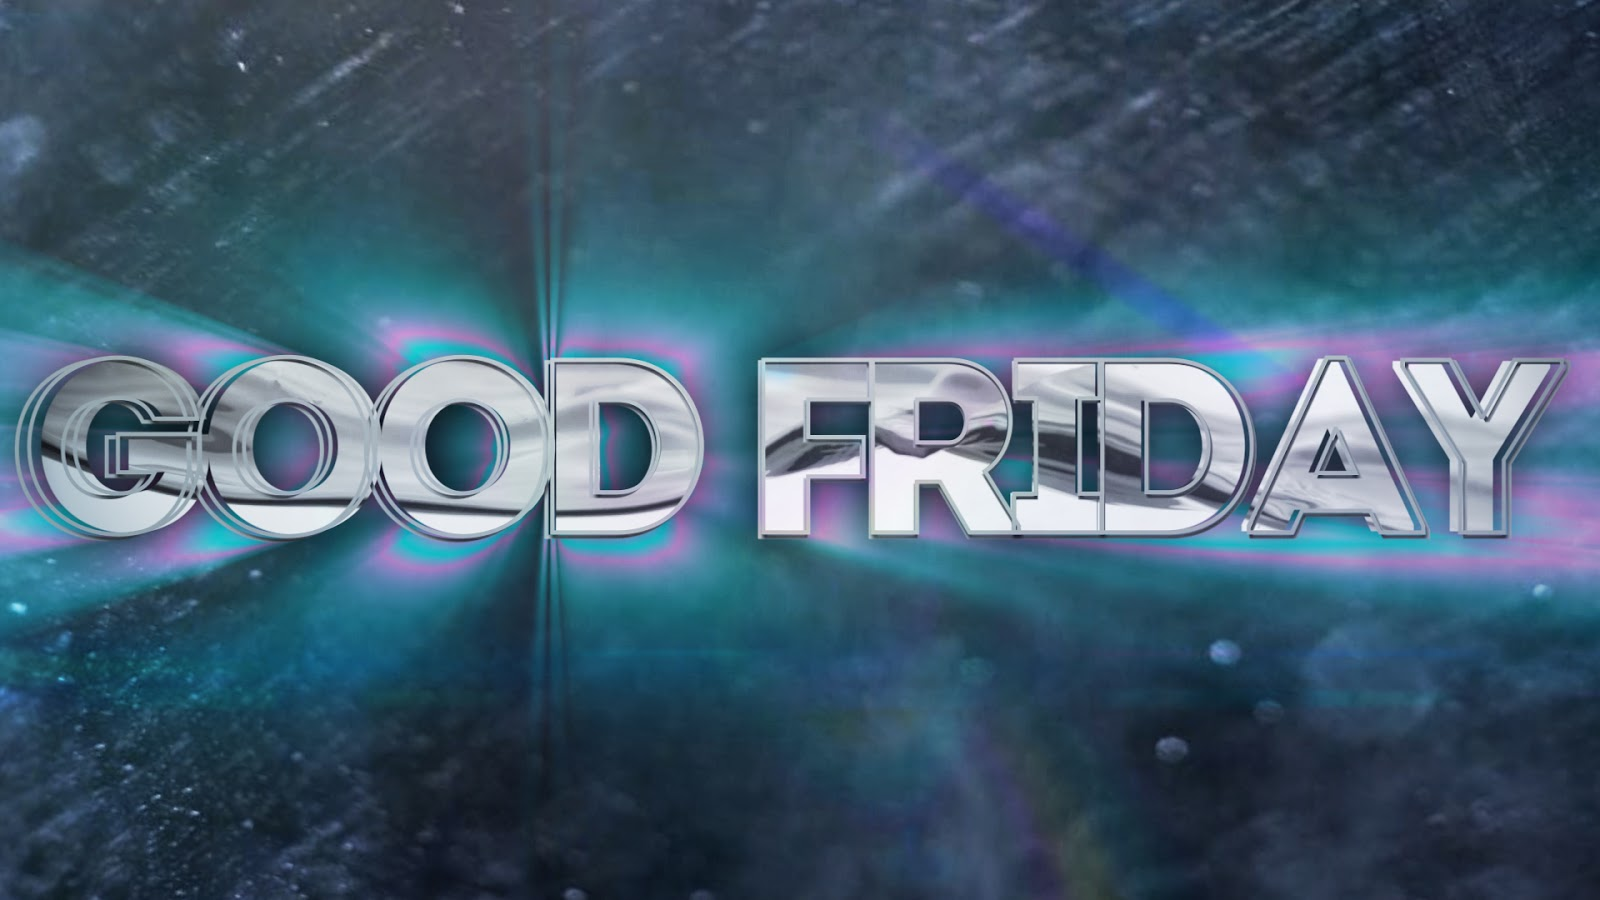 Good Friday Wallpaper Desktop Hd Free